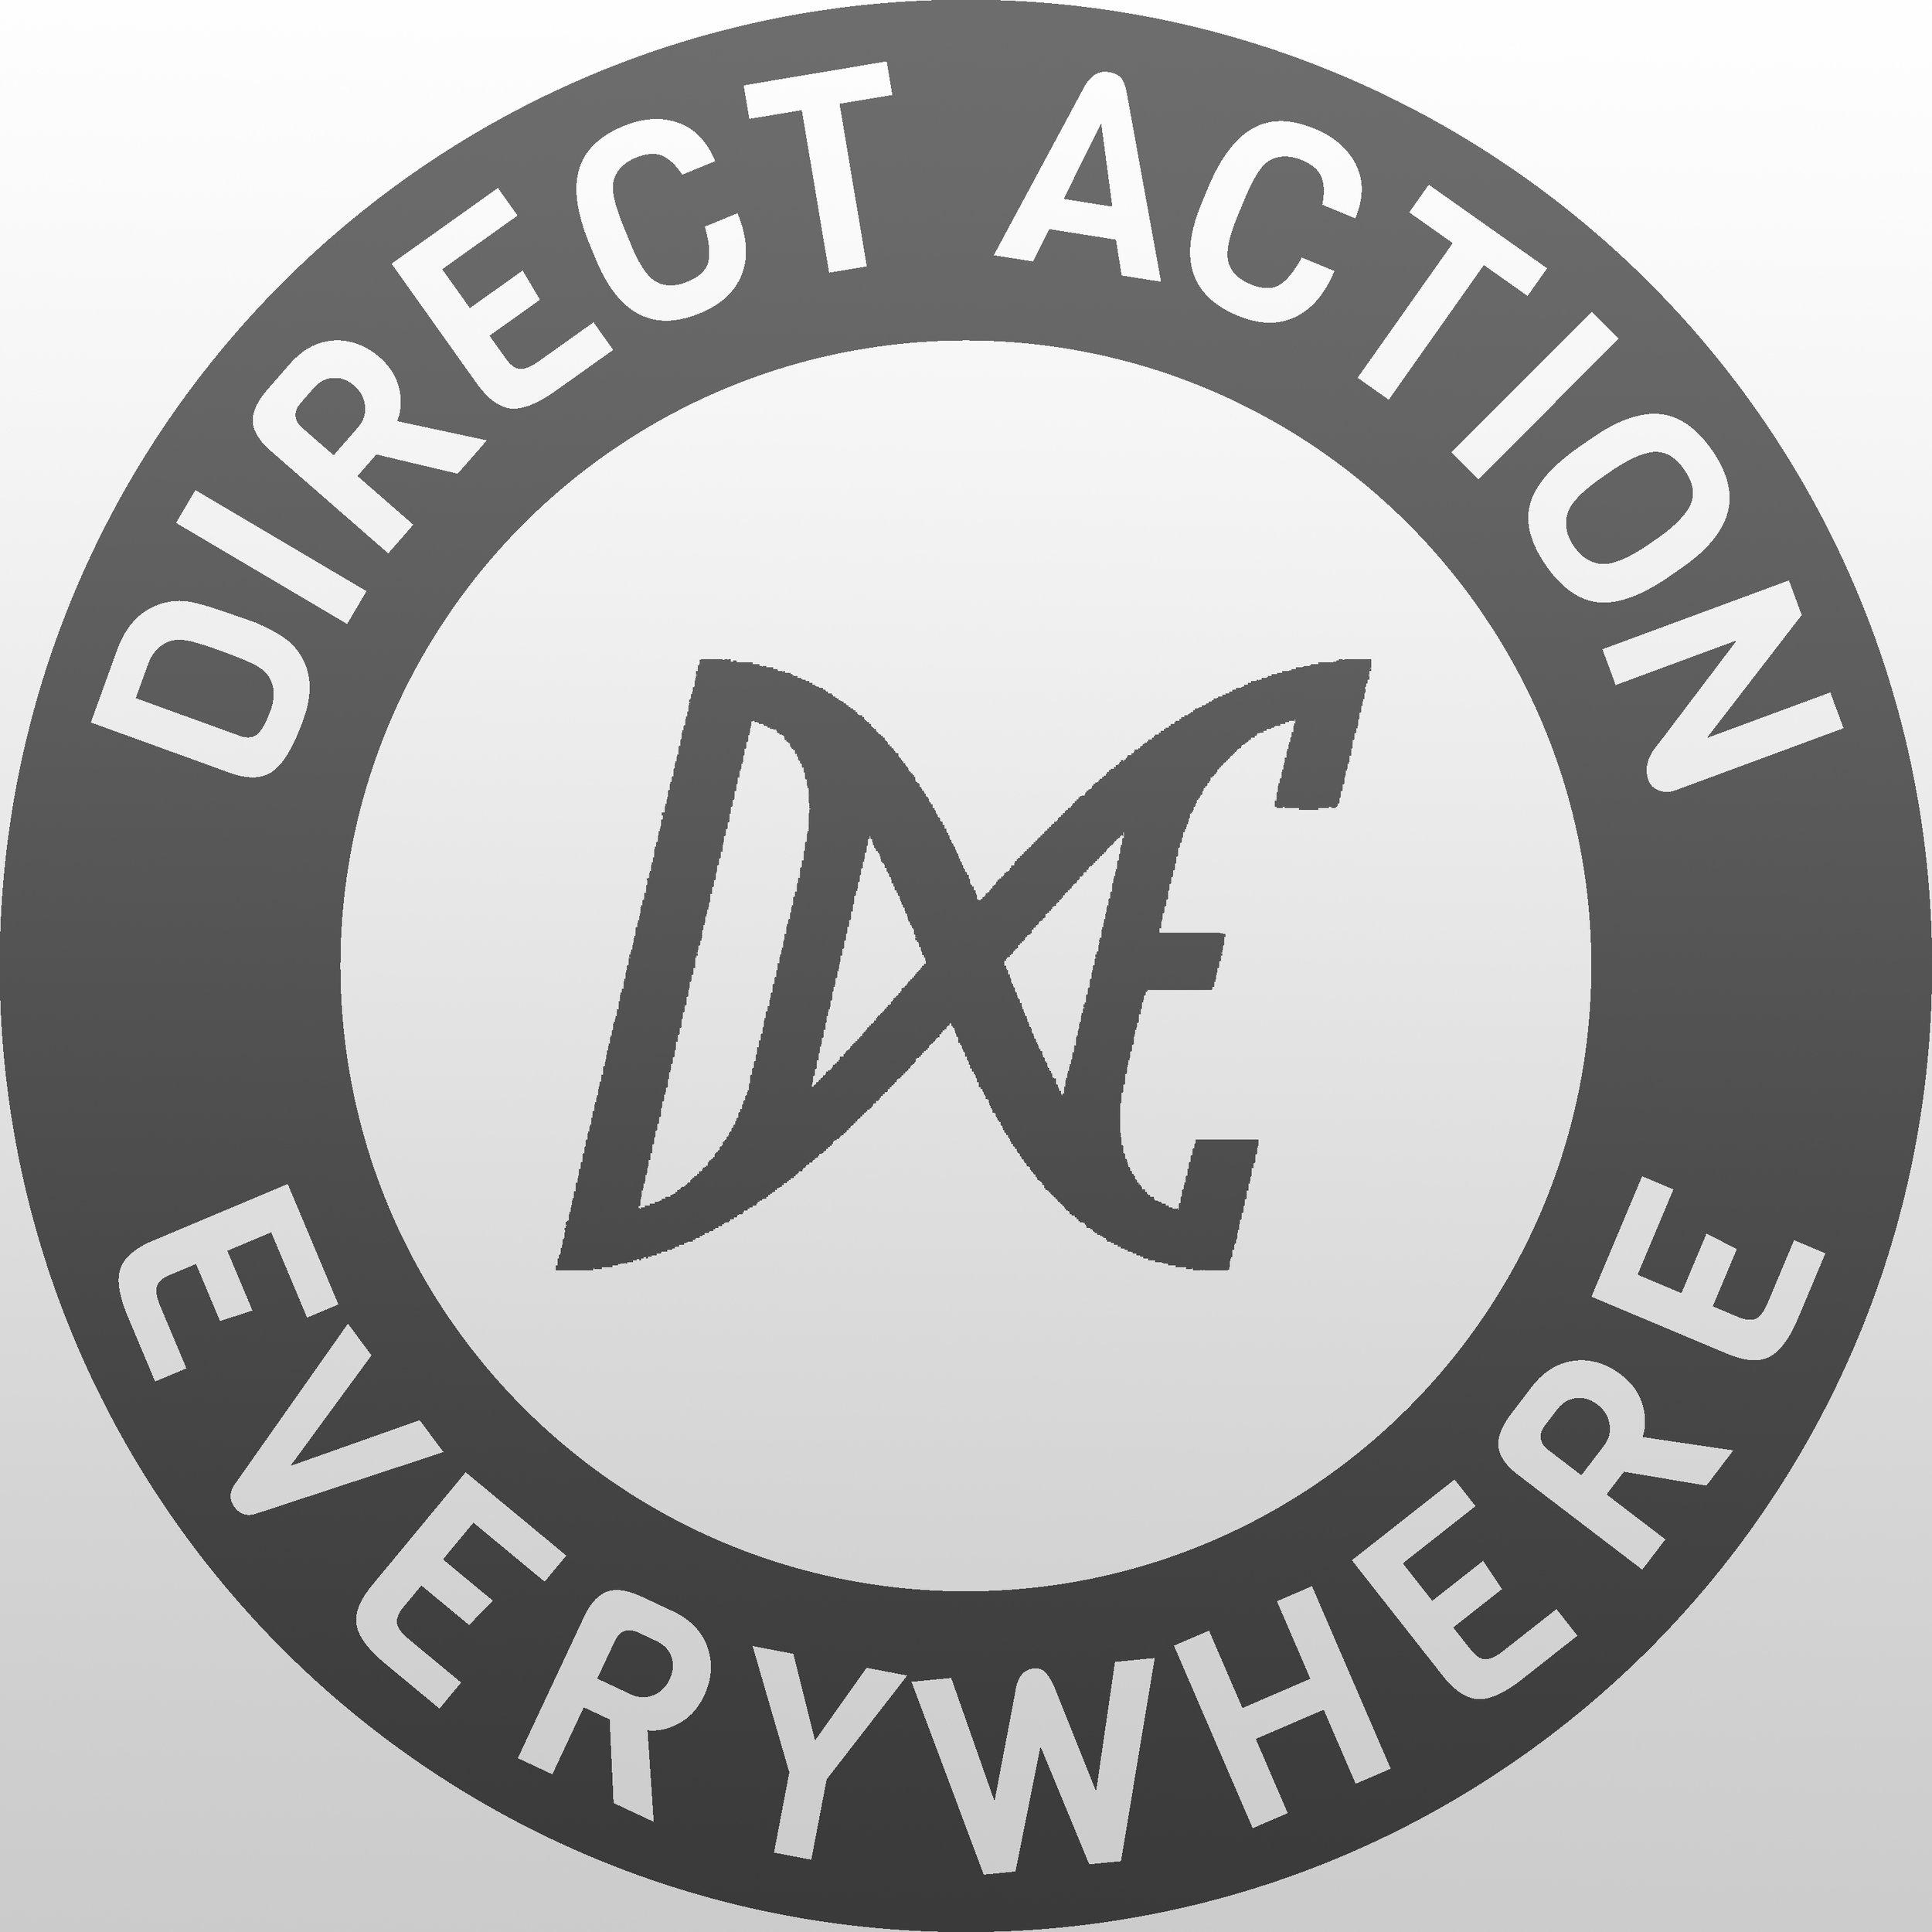 dxe circle gradiant logo 2019.jpg